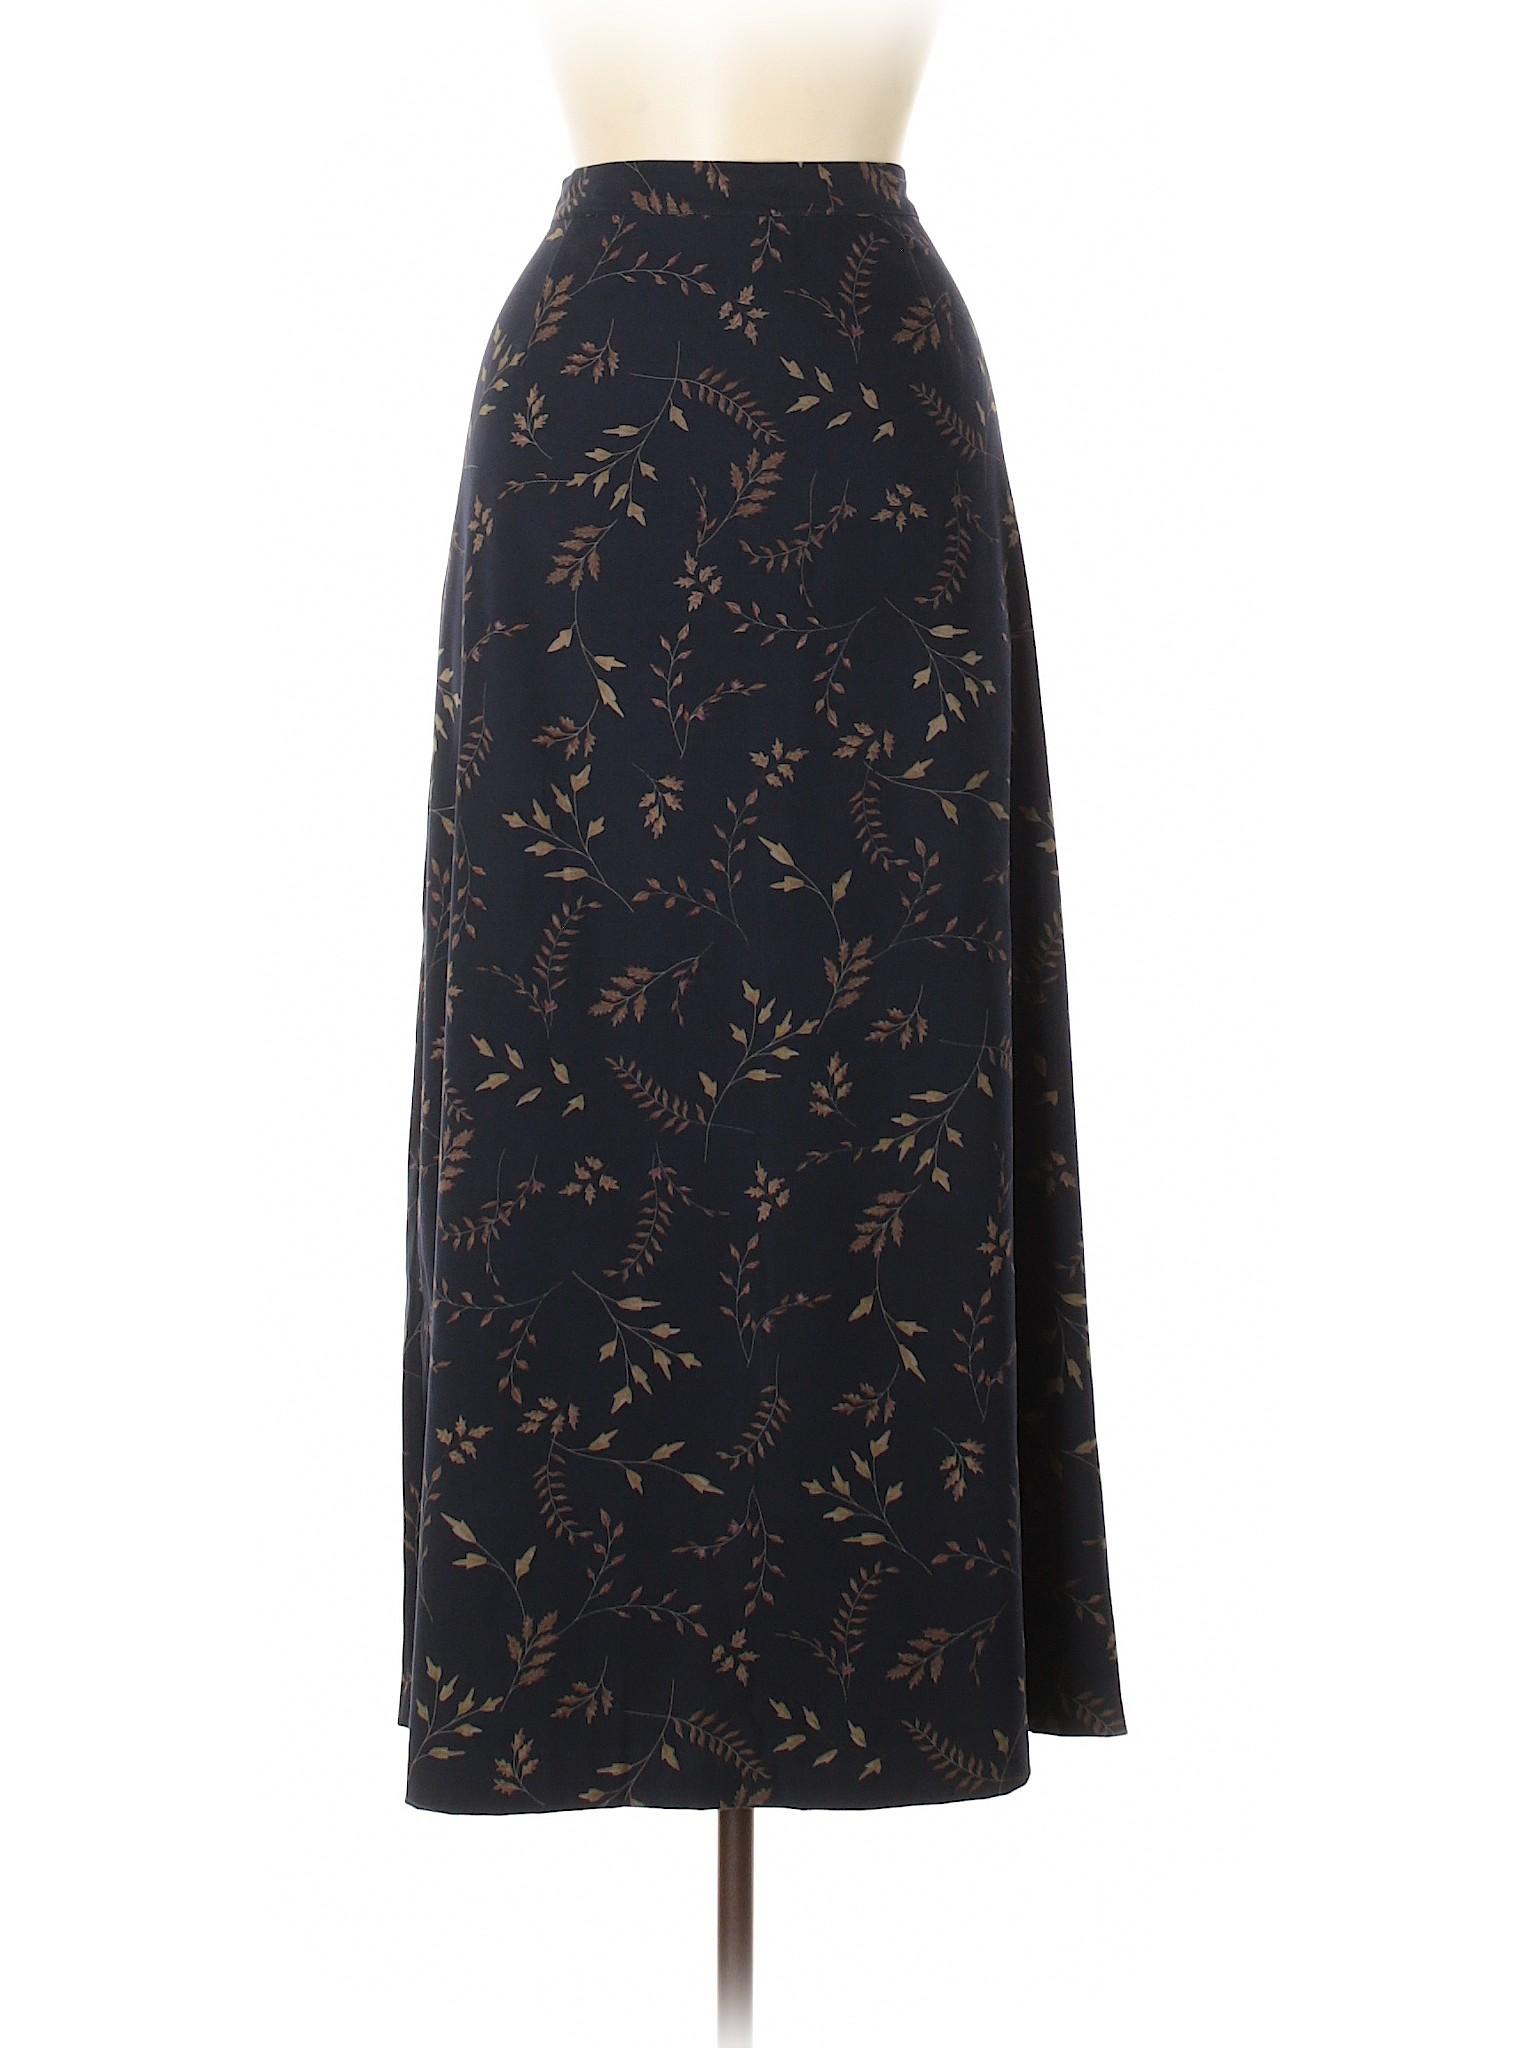 Skirt Casual Boutique Casual Casual Skirt Casual Boutique Boutique Boutique Skirt xqwafBzU